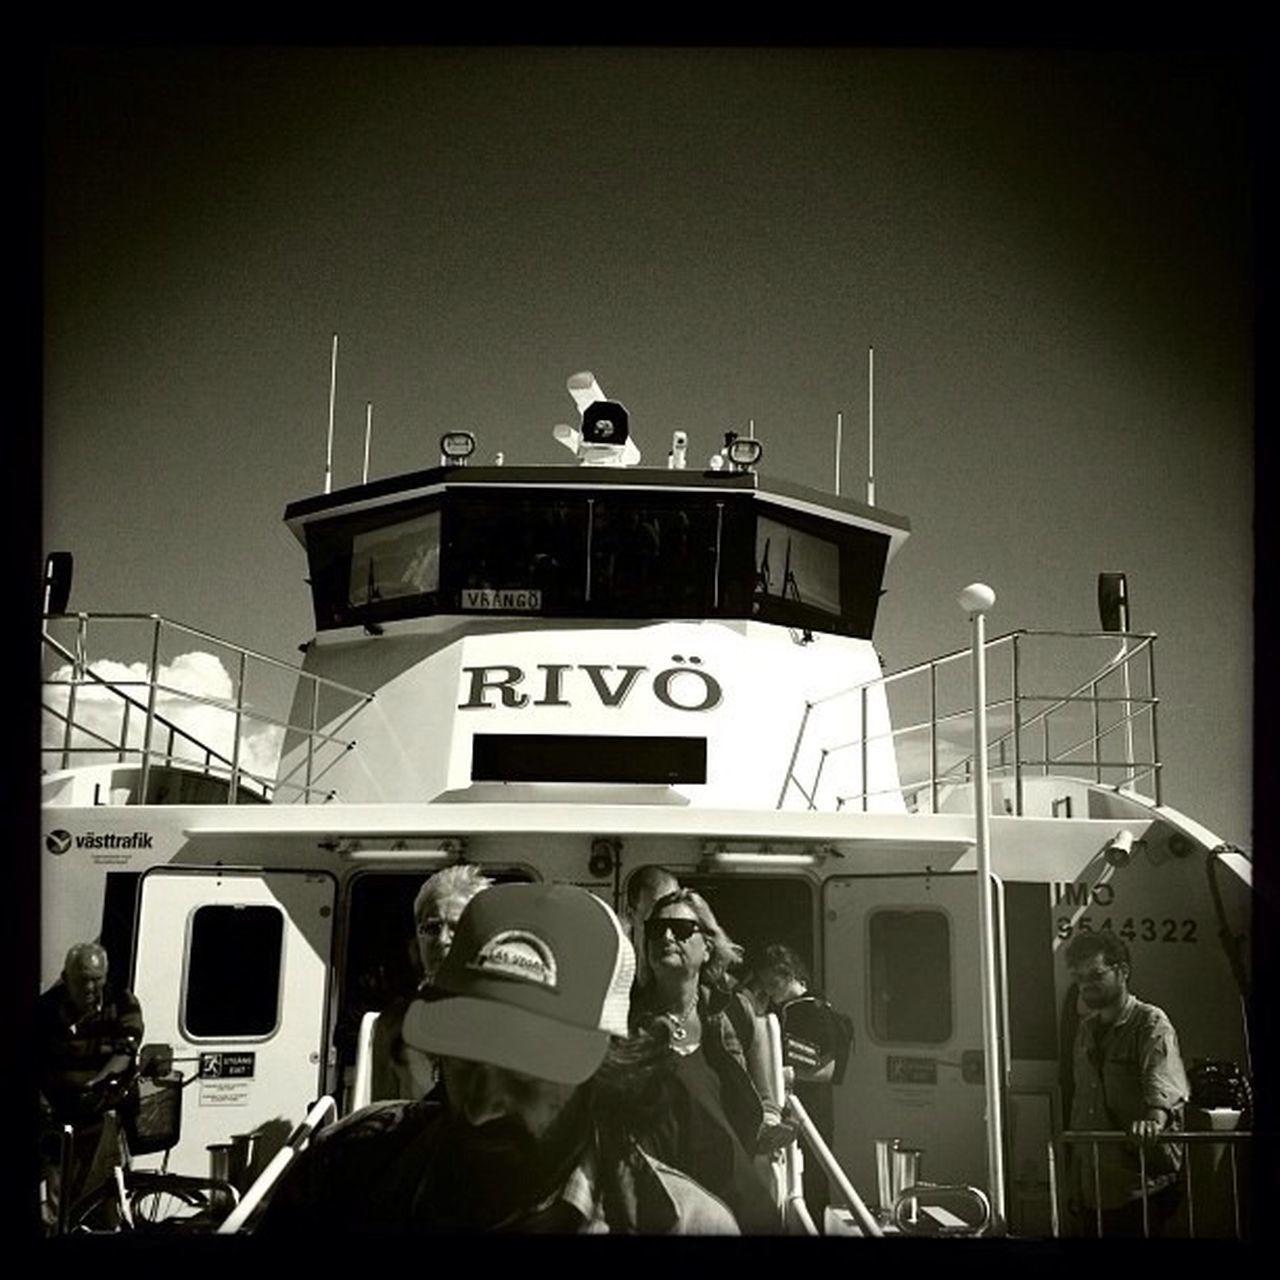 nautical vessel, transportation, clear sky, uniform, real people, outdoors, building exterior, men, sky, night, people